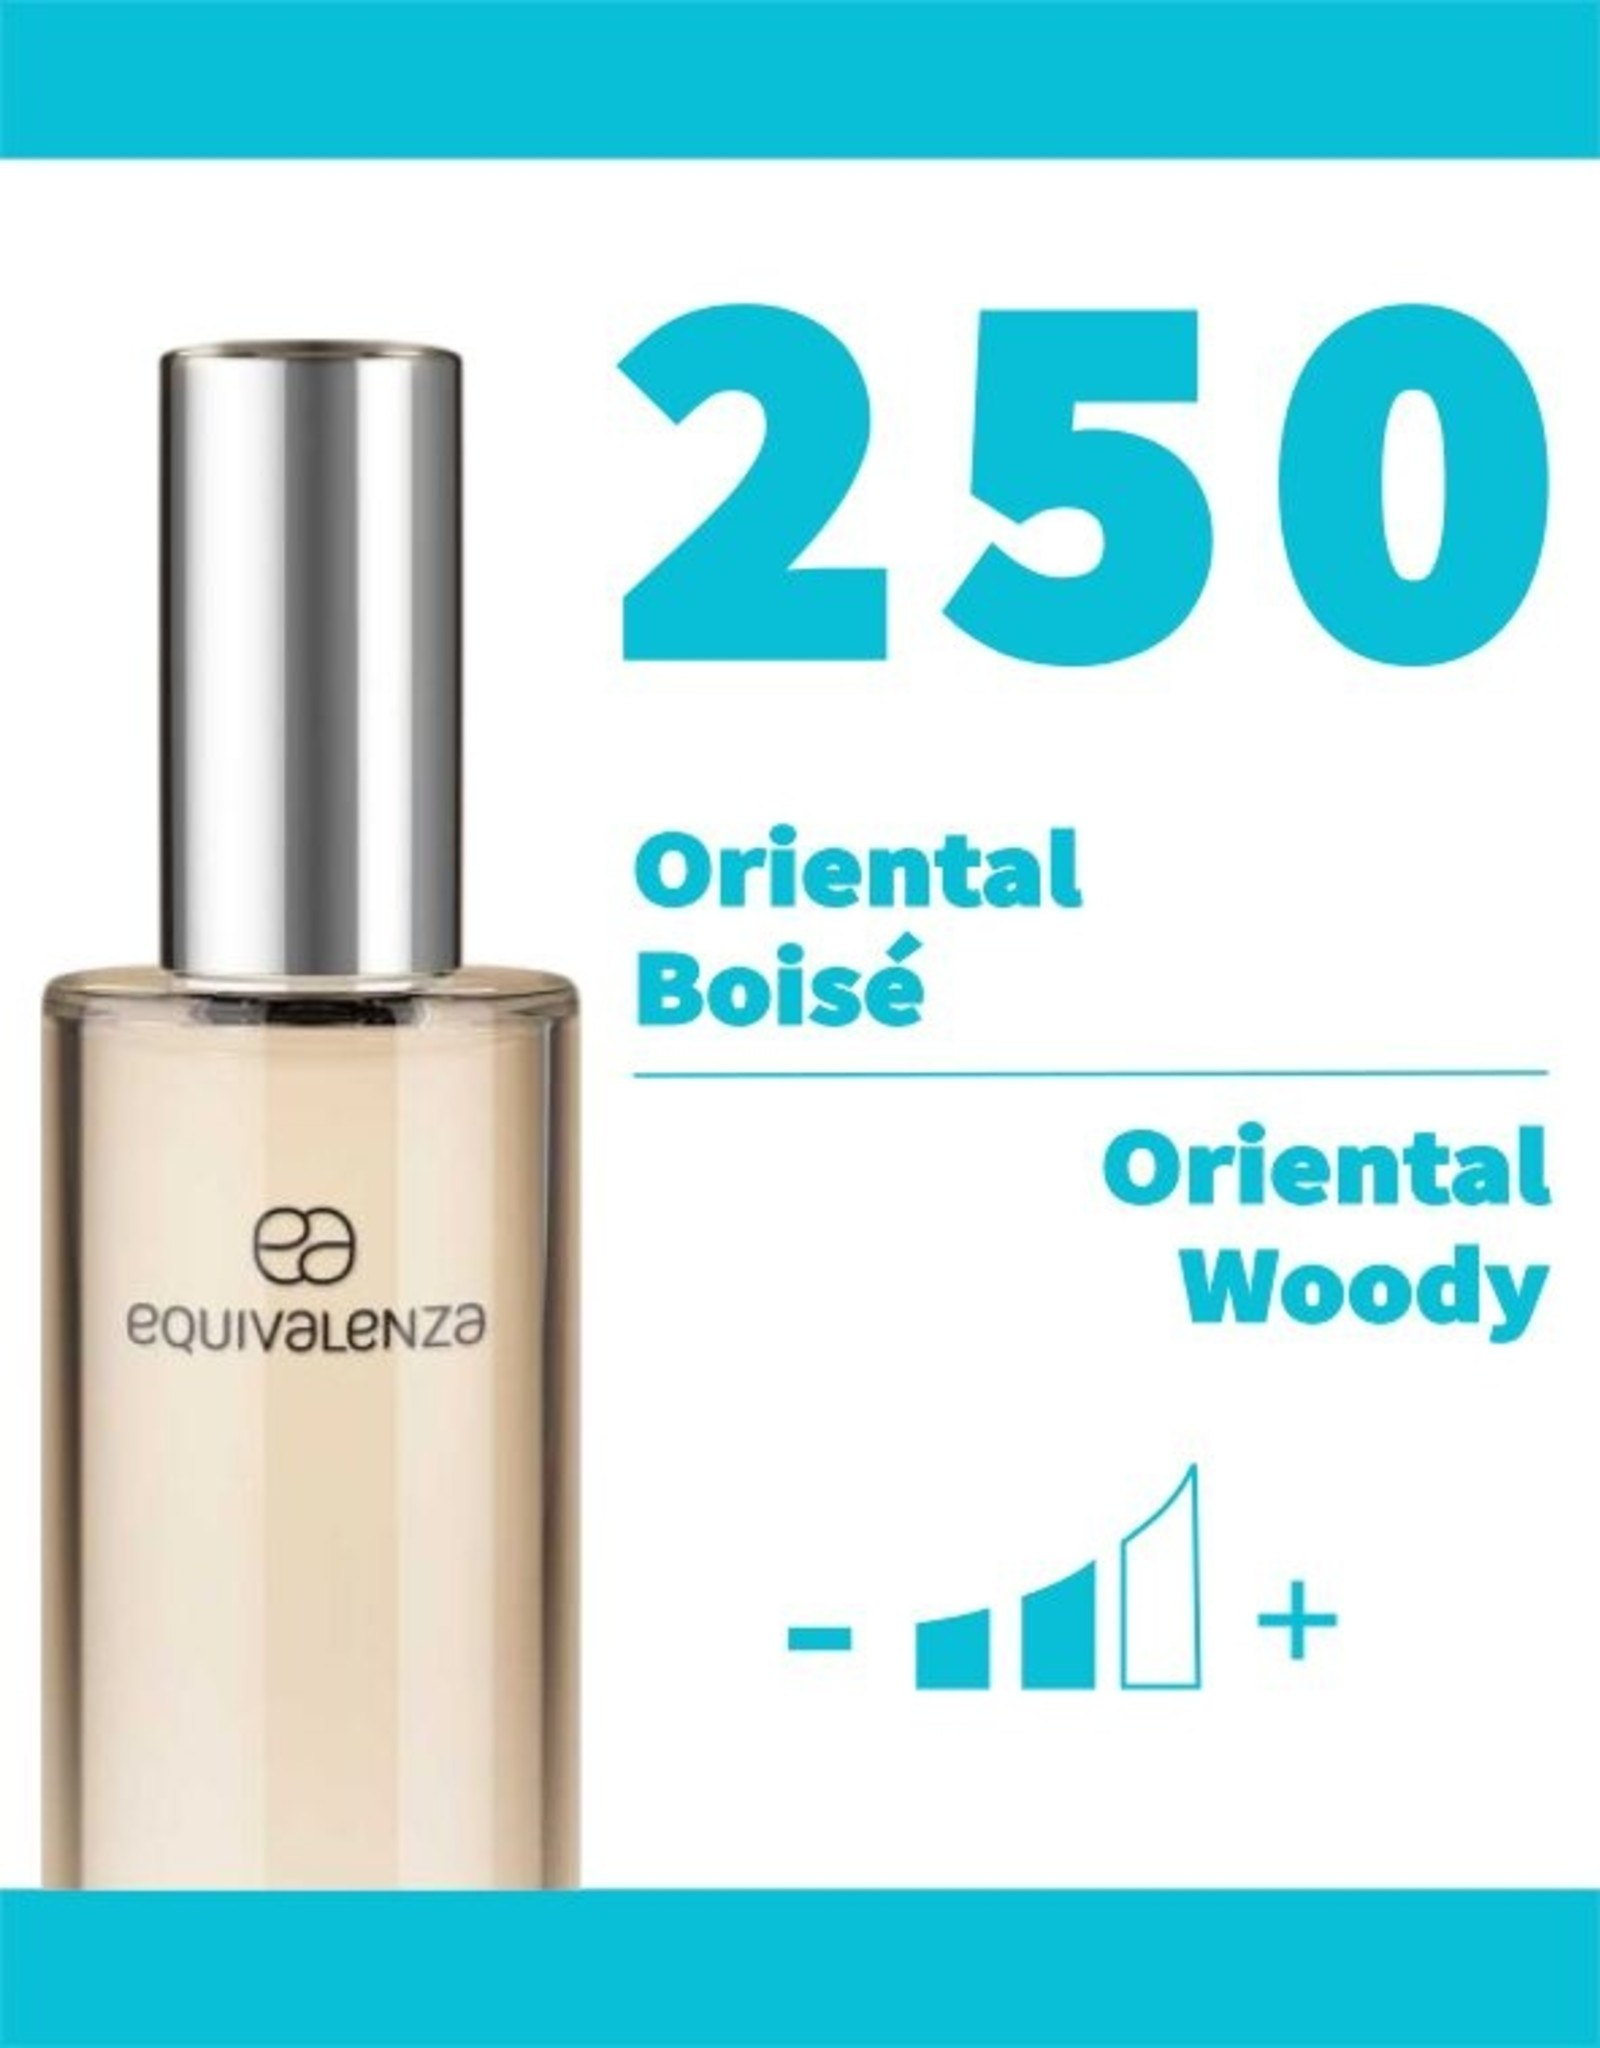 Equivalenza Eau de Toilette Oriental Woody 250